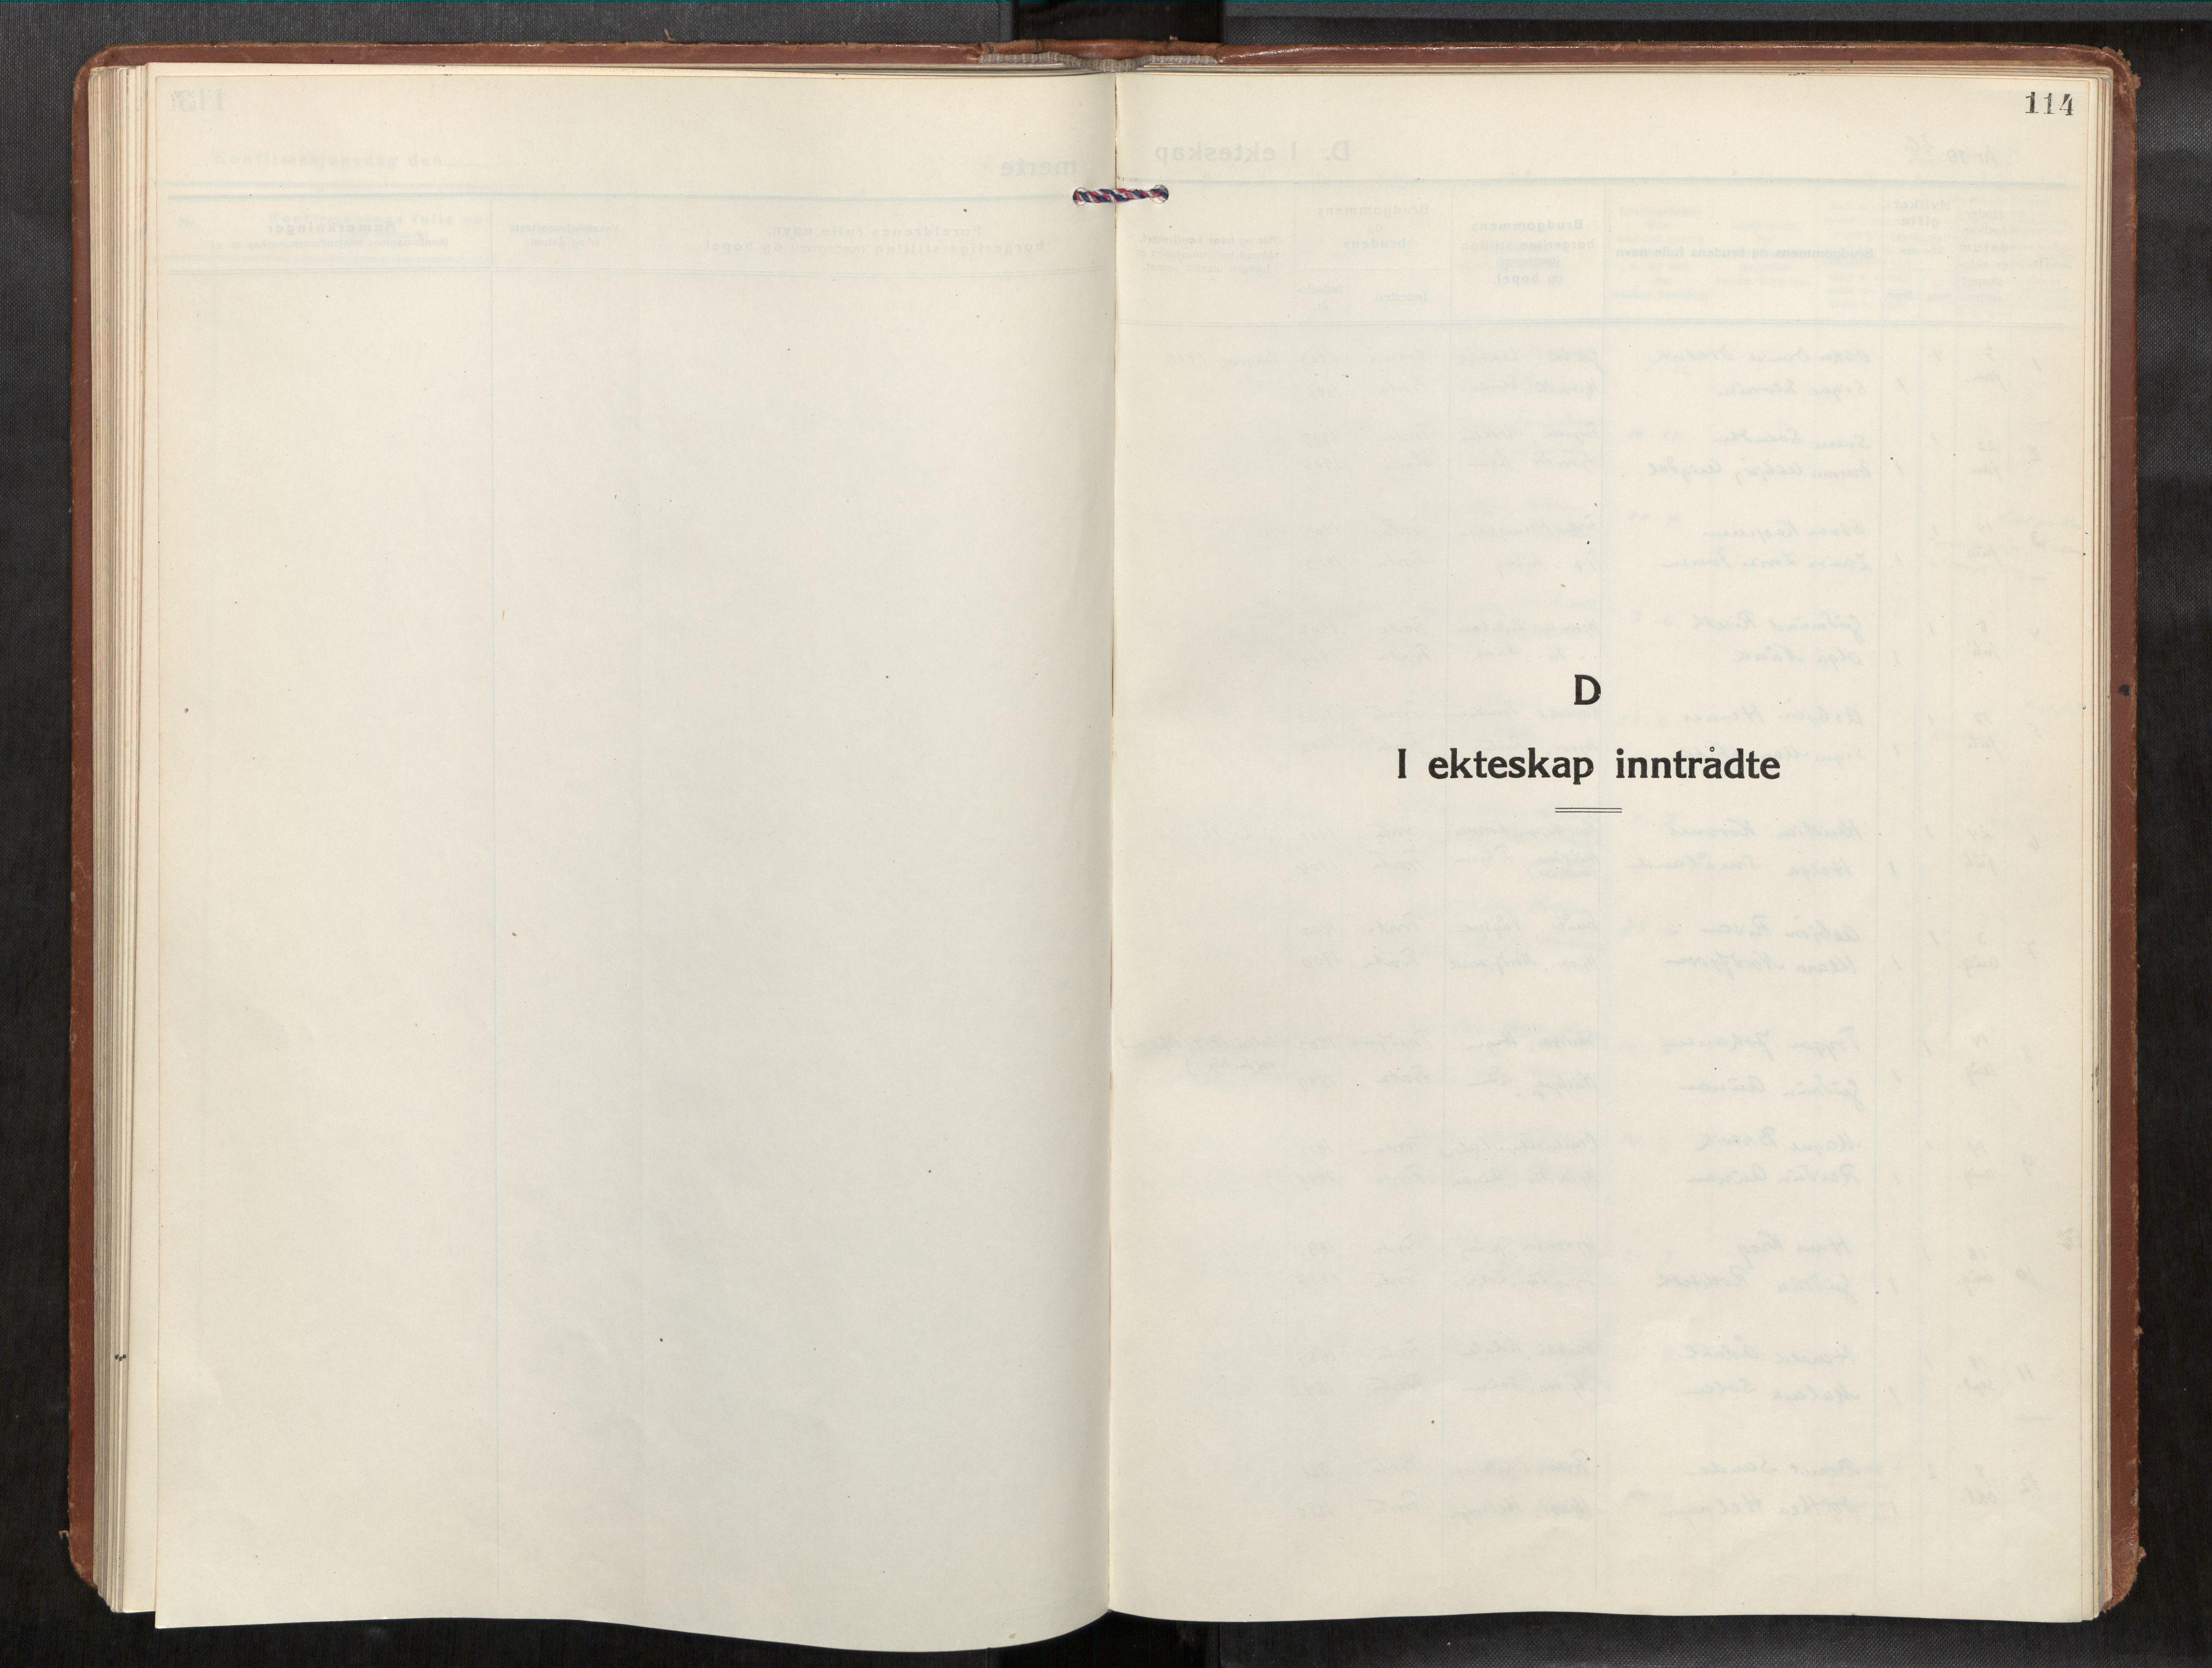 SAT, Frosta sokneprestkontor, H/Haa/L0001: Ministerialbok nr. 1, 1926-1934, s. 114